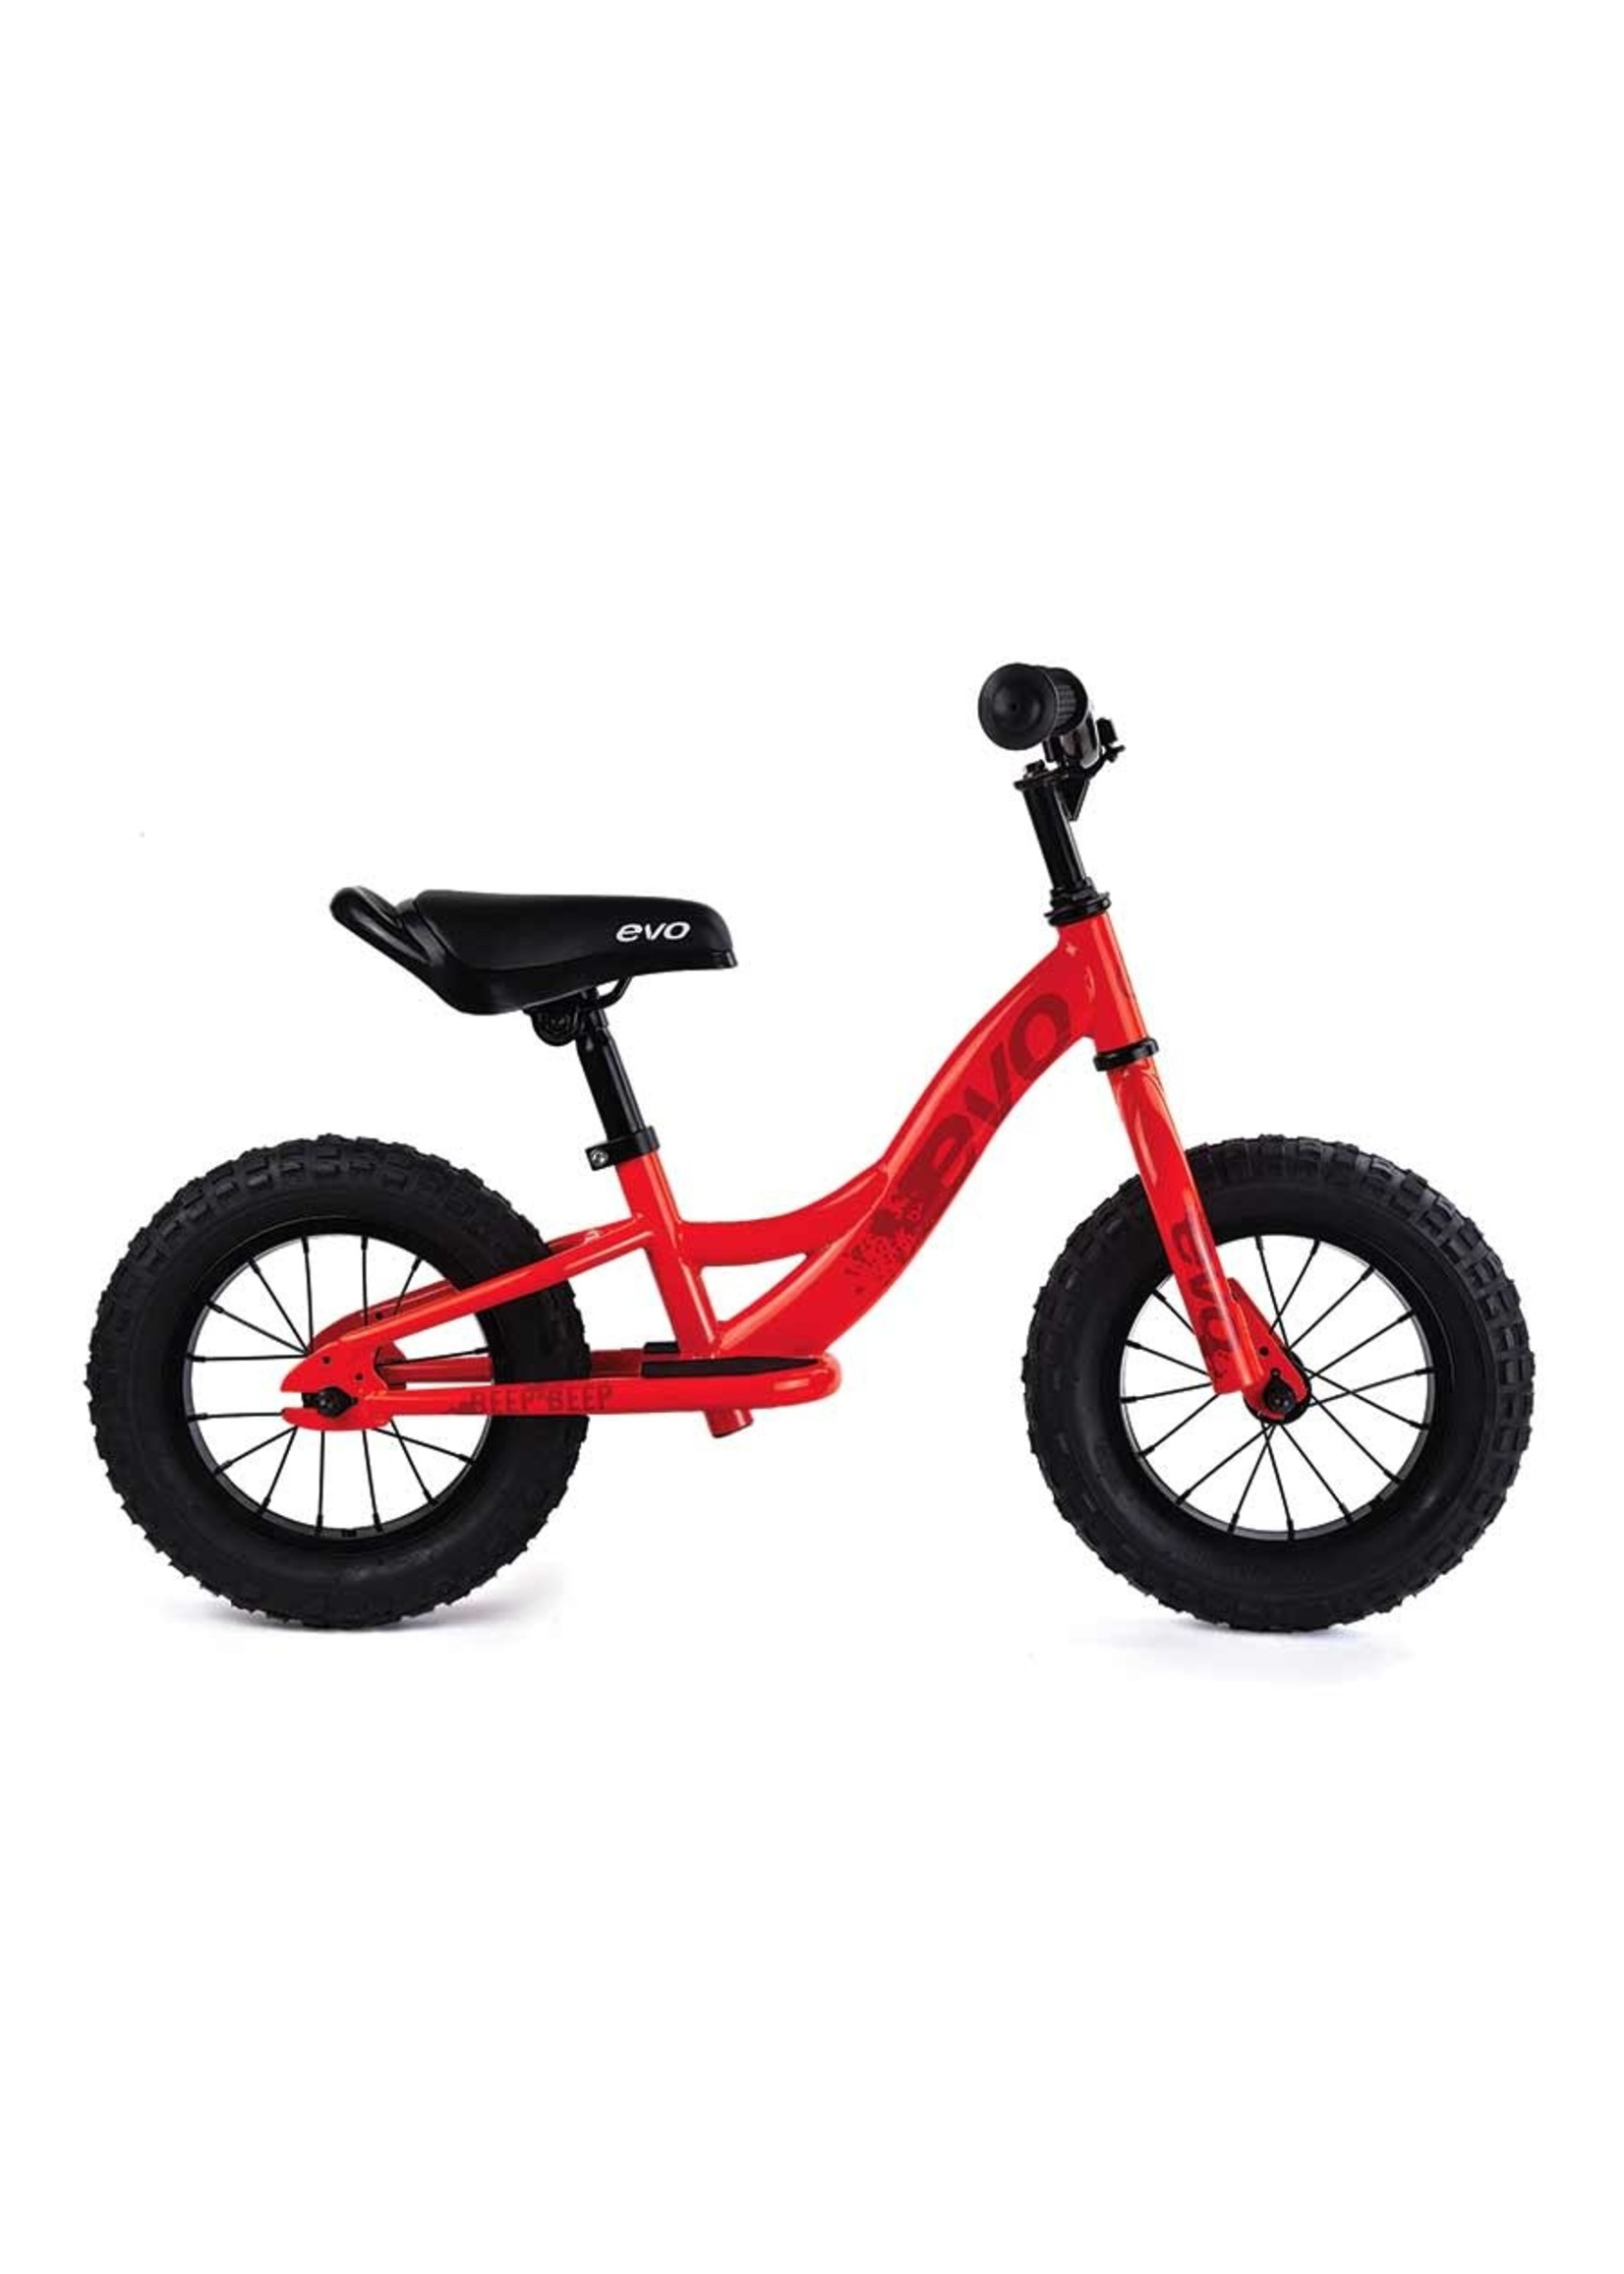 Evo EVO, Beep Beep, Push Bike